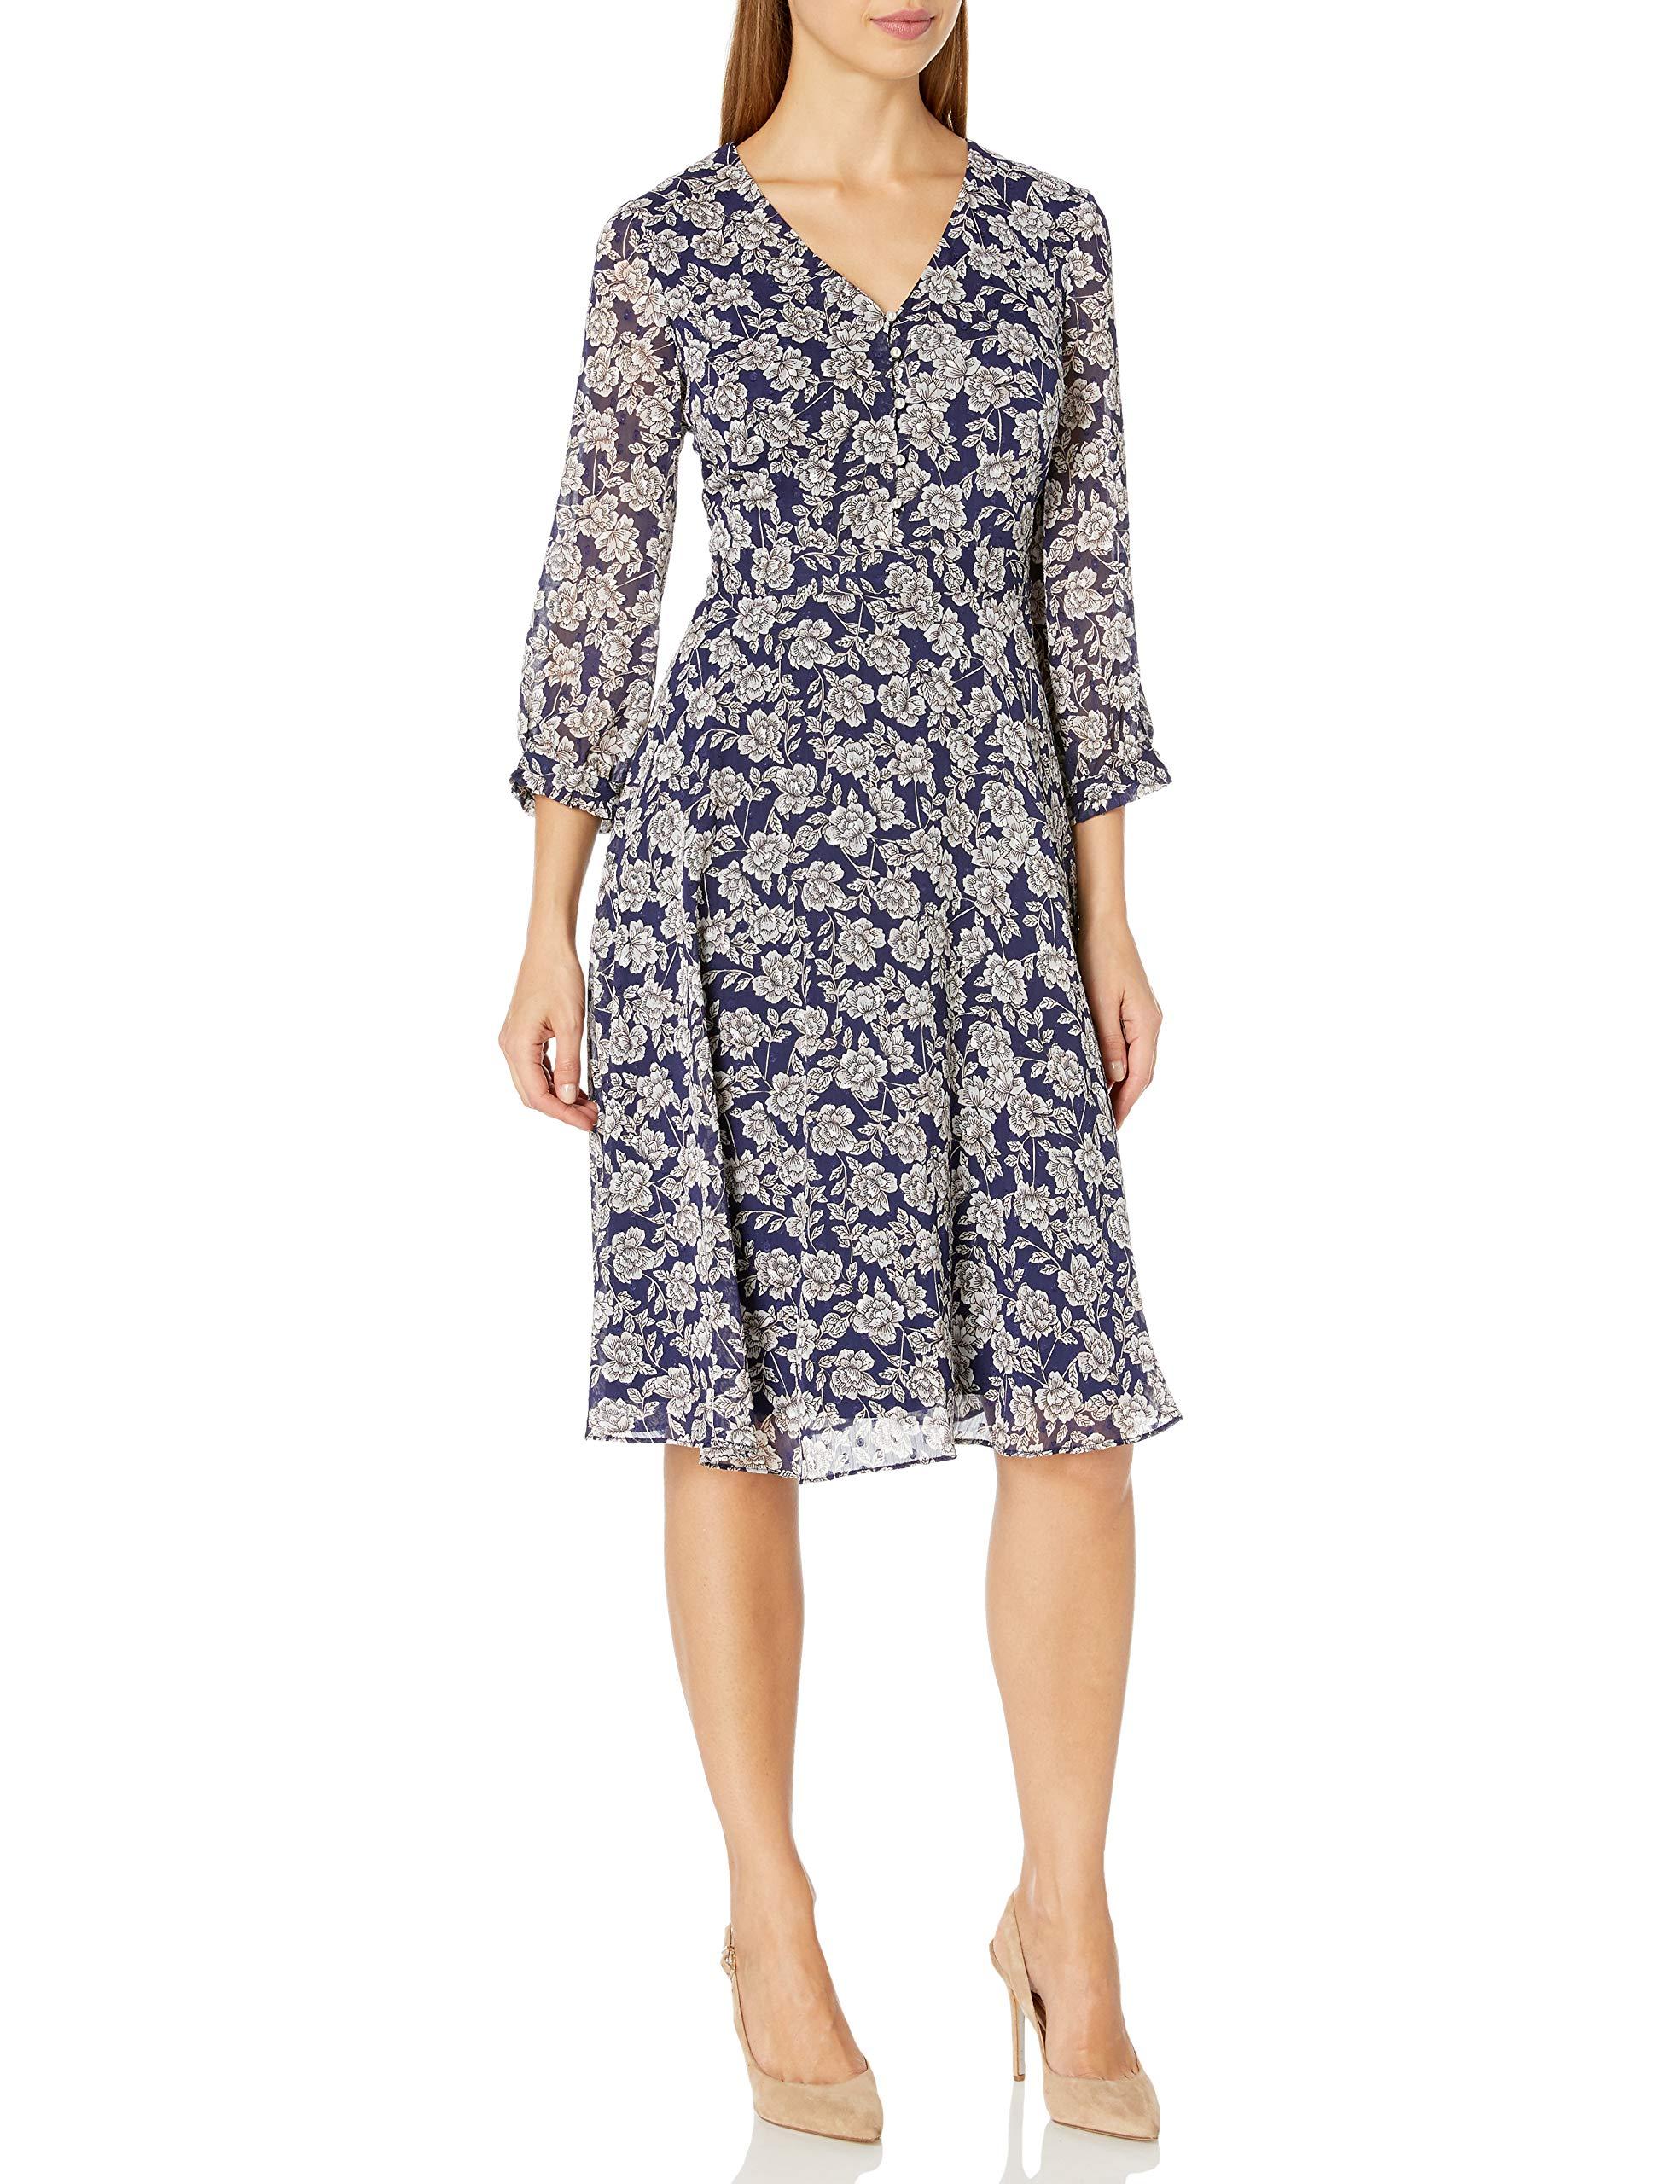 Karl Lagerfeld Paris Women's Floral Printed Chiffon Midi Dress